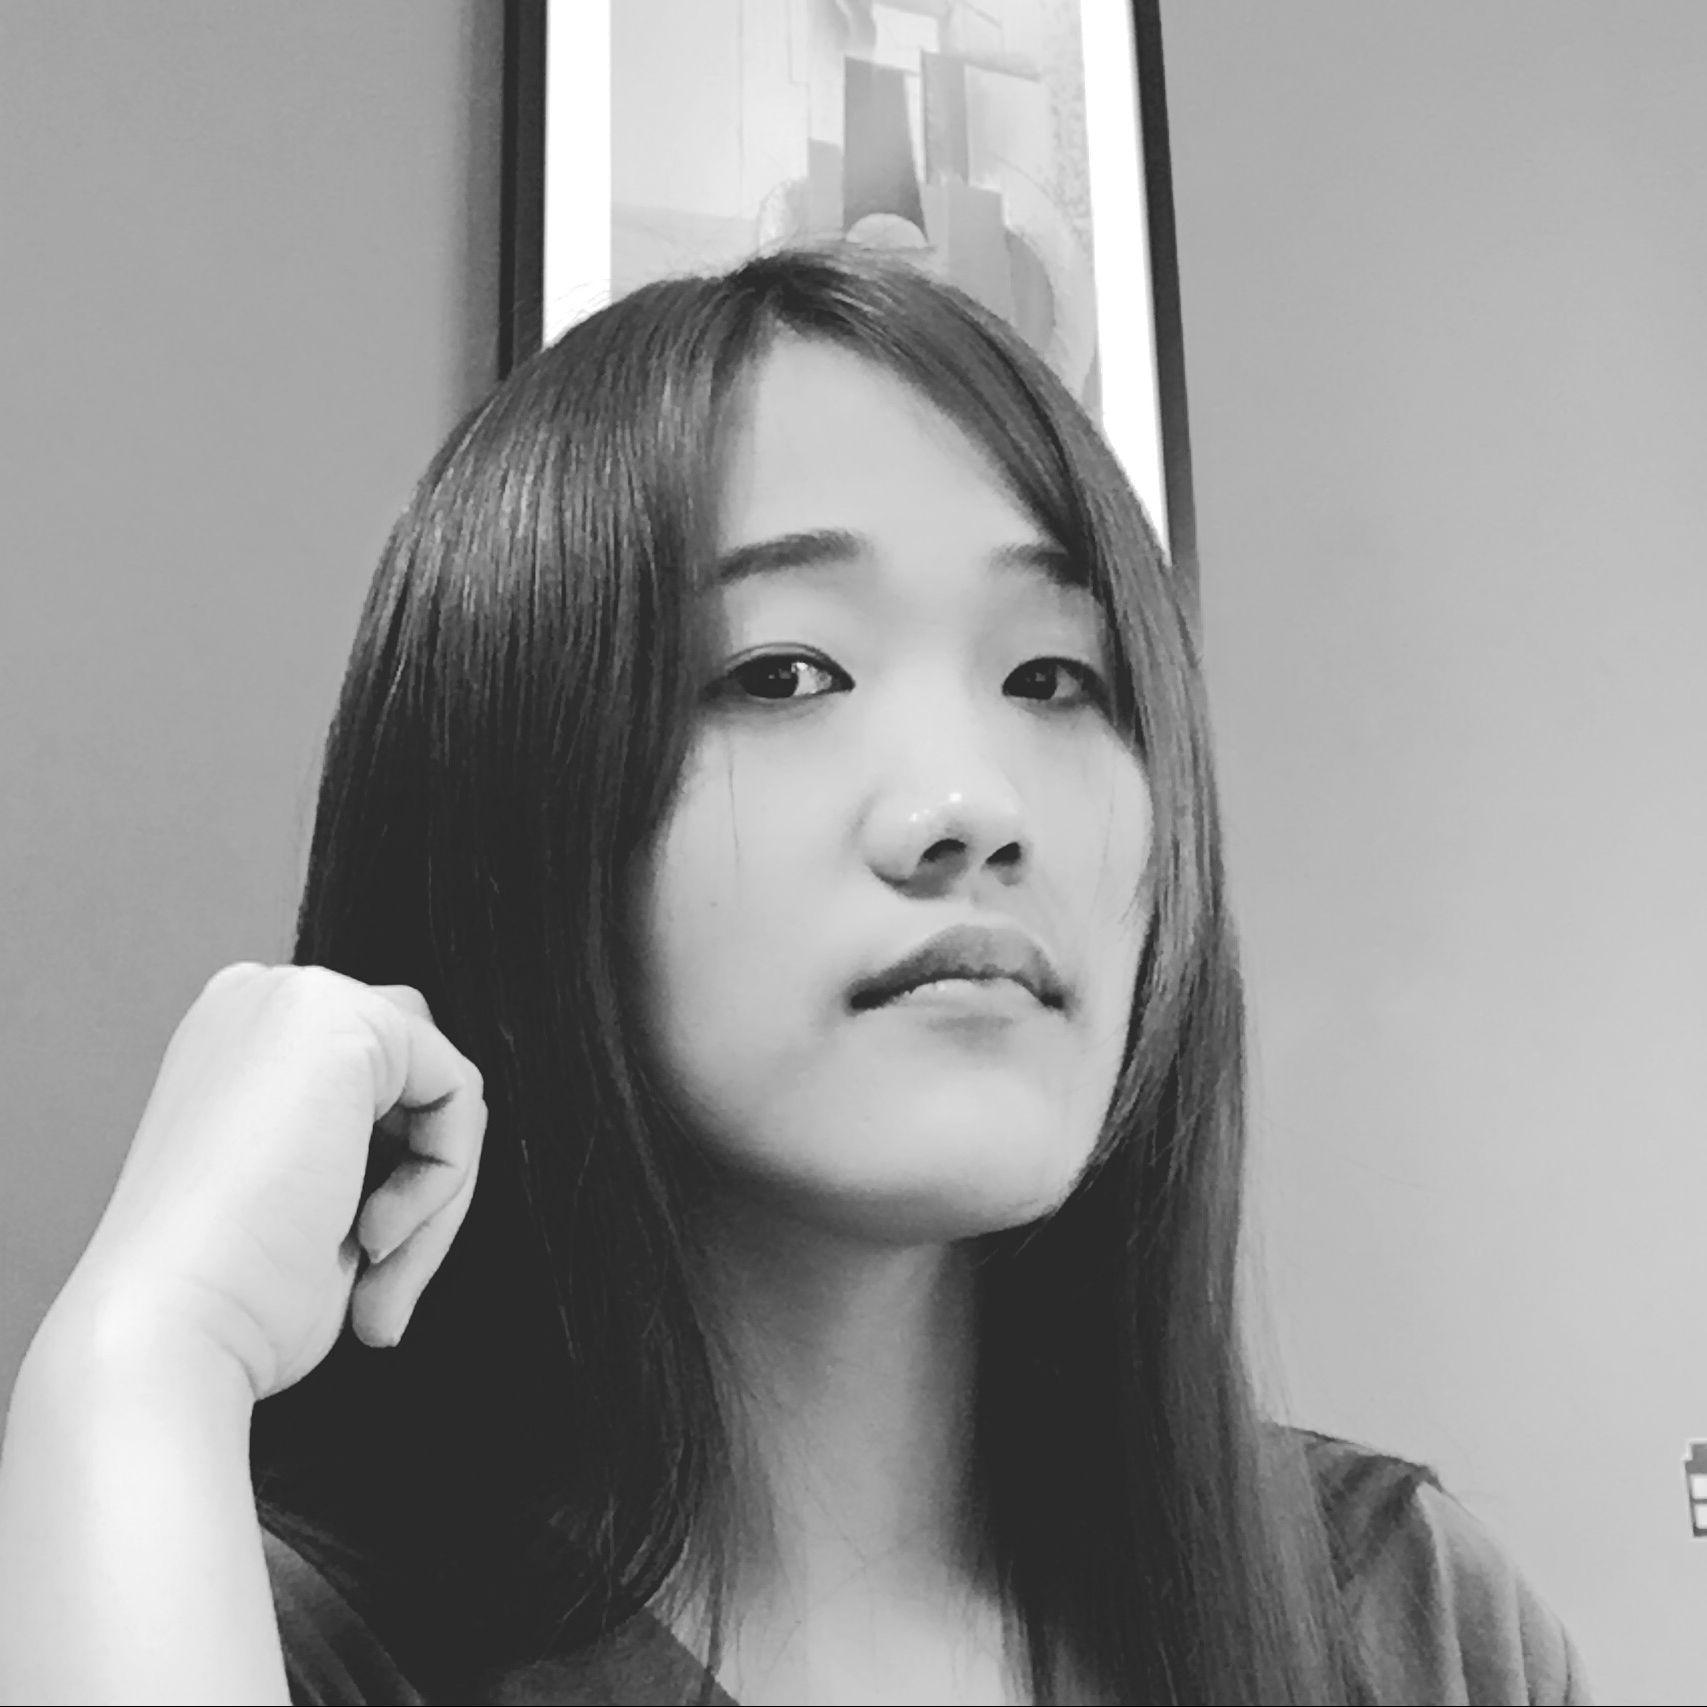 Senny-zhan